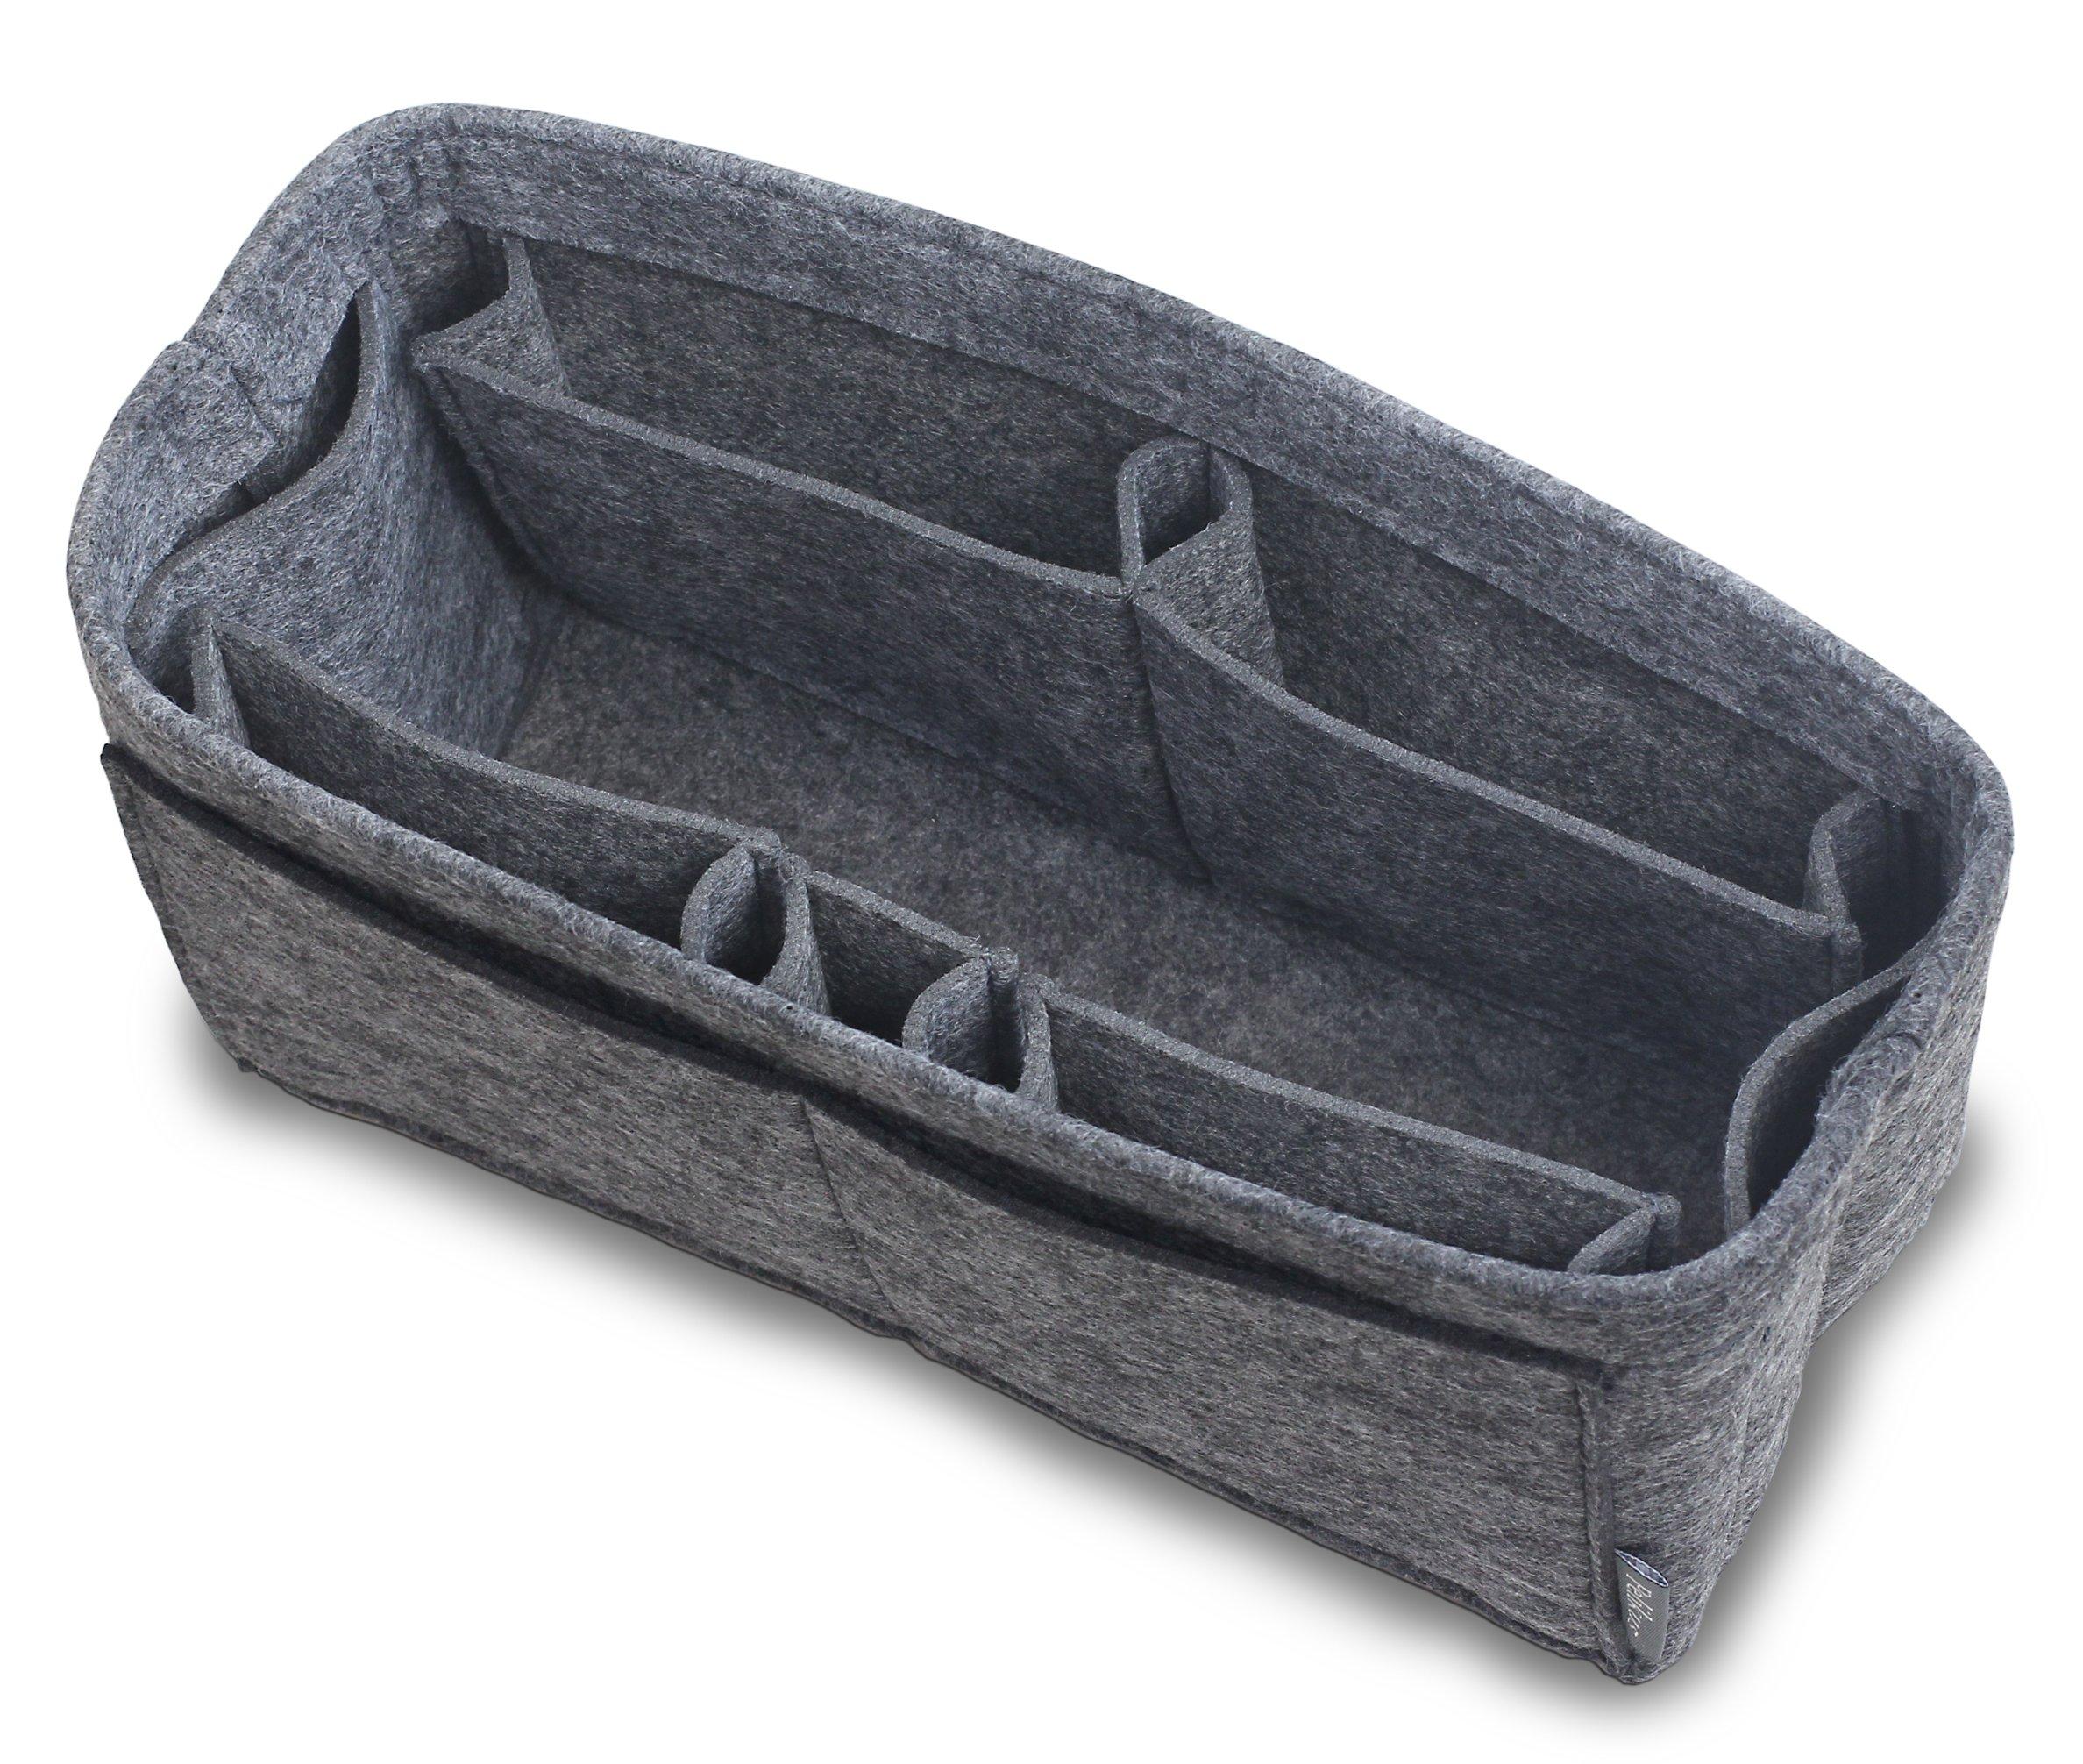 Pelikus Felt Purse and Tote Organizer Insert/Sturdy Structured Handbag Shaper (Large–Slender, Grey)